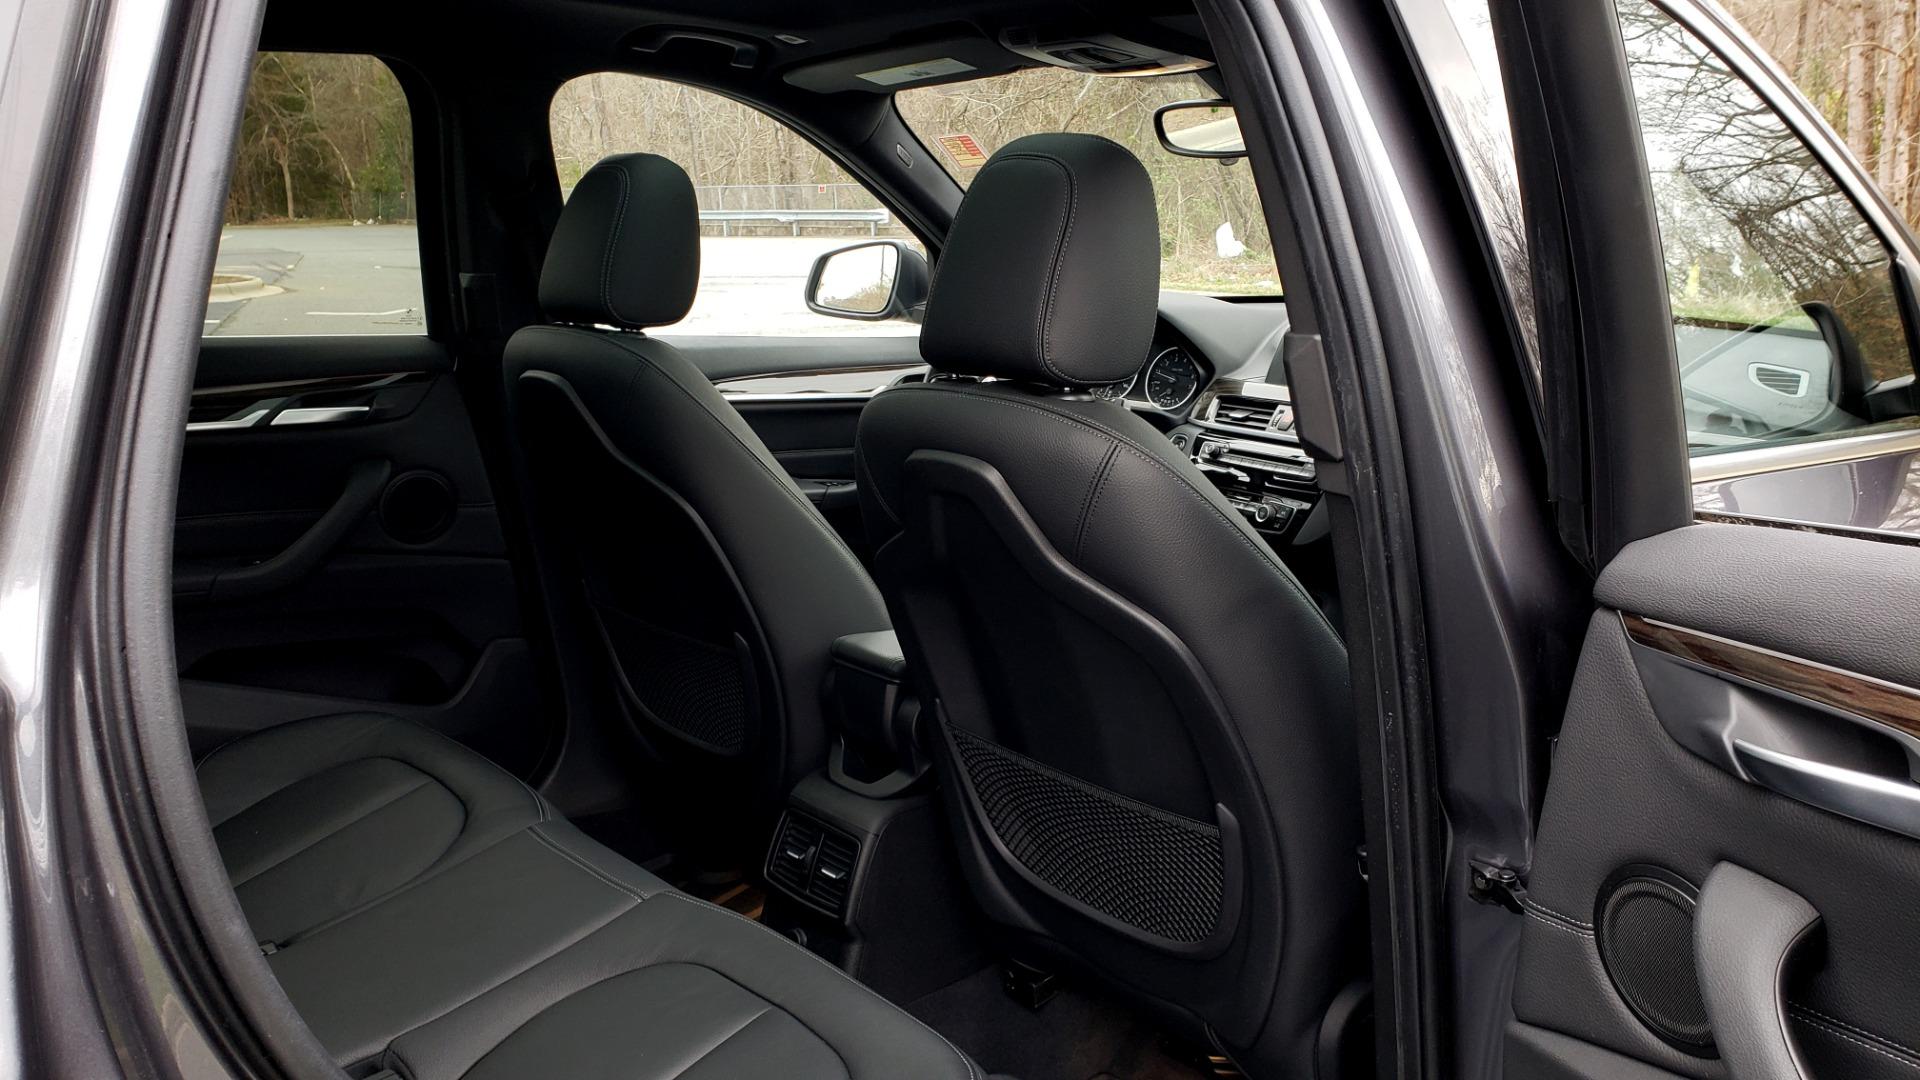 Used 2017 BMW X1 XDRIVE28I / PREM PKG / DRIVER ASST / NAV / CLD WTHR for sale Sold at Formula Imports in Charlotte NC 28227 79